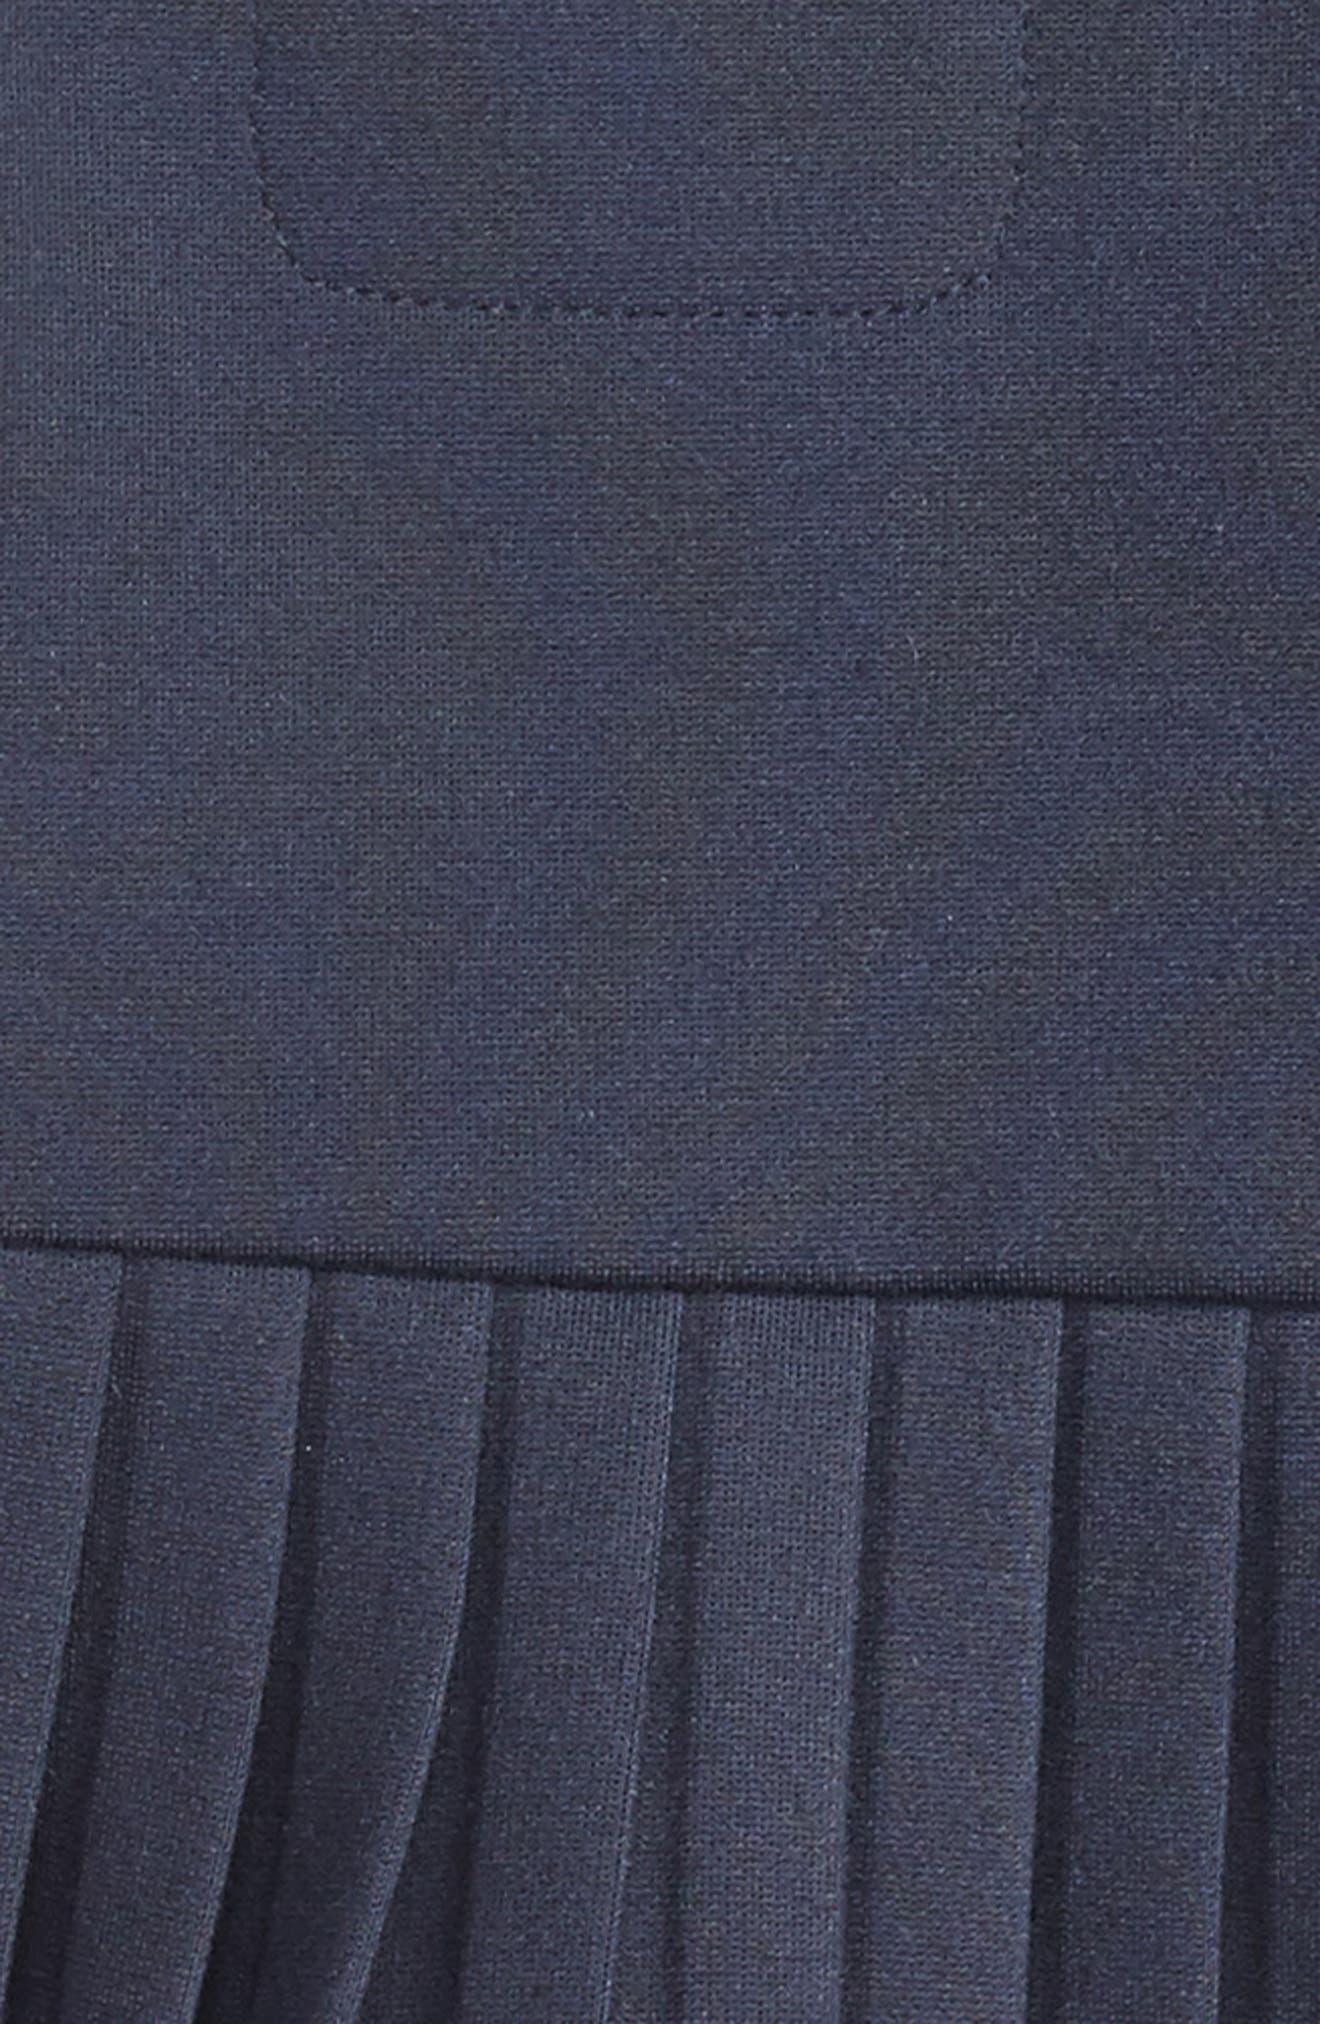 Sleeveless Jersey Dress,                             Alternate thumbnail 3, color,                             Navy Blue